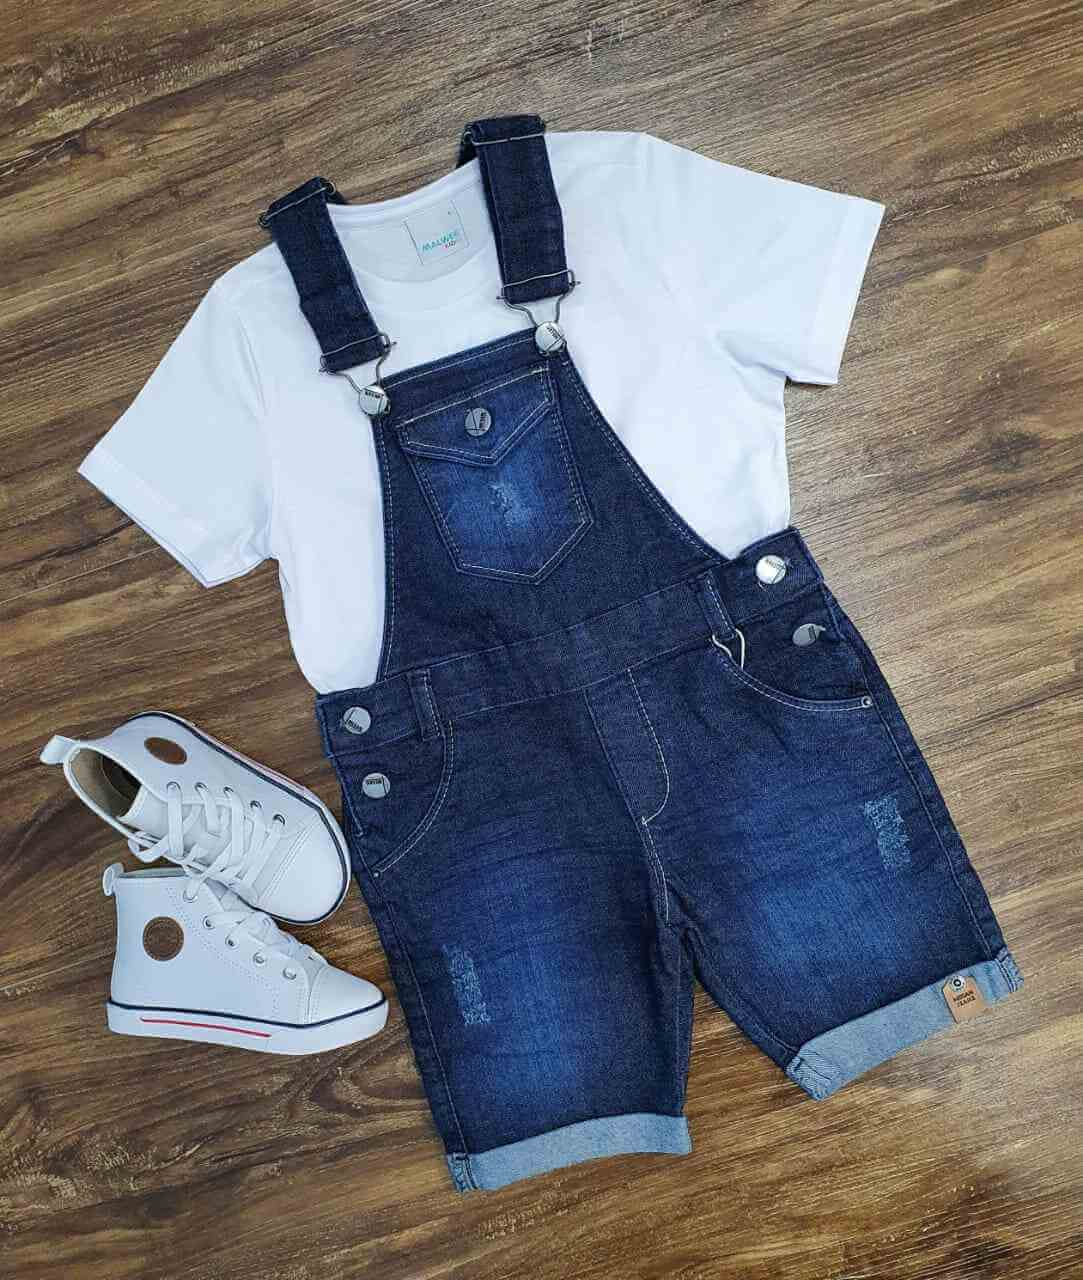 Jardineira Bermuda com Camiseta Branca Infantil